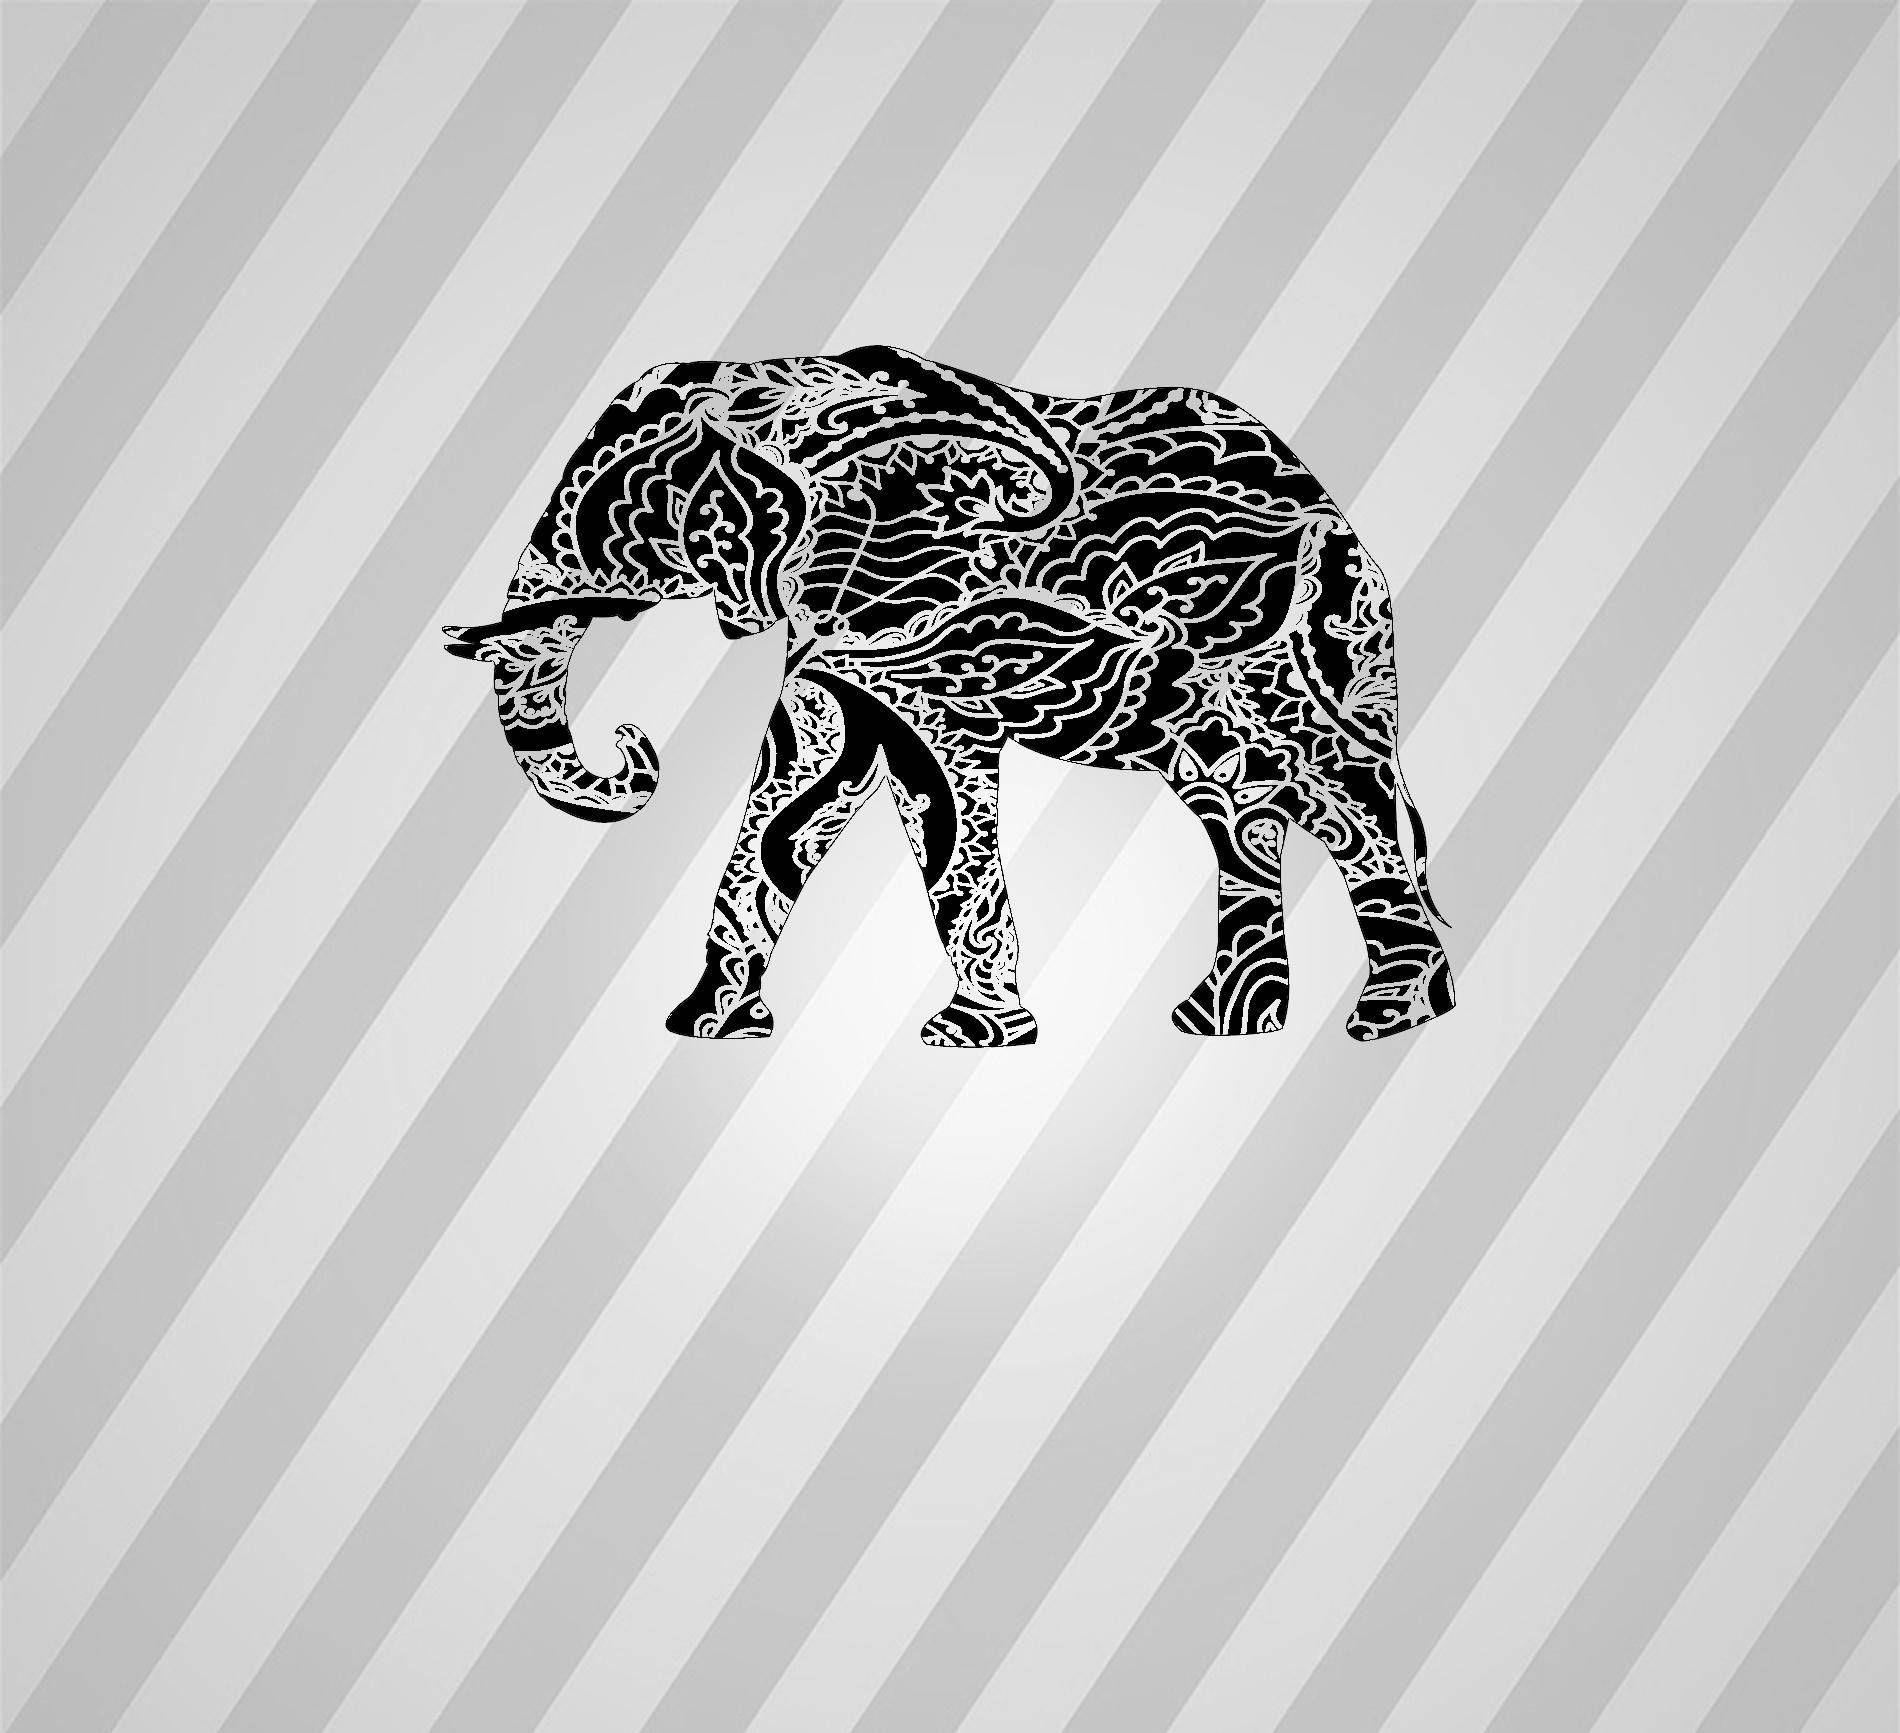 Elephant Papercut Template Elephants - Svg Paper Cut Templates ...